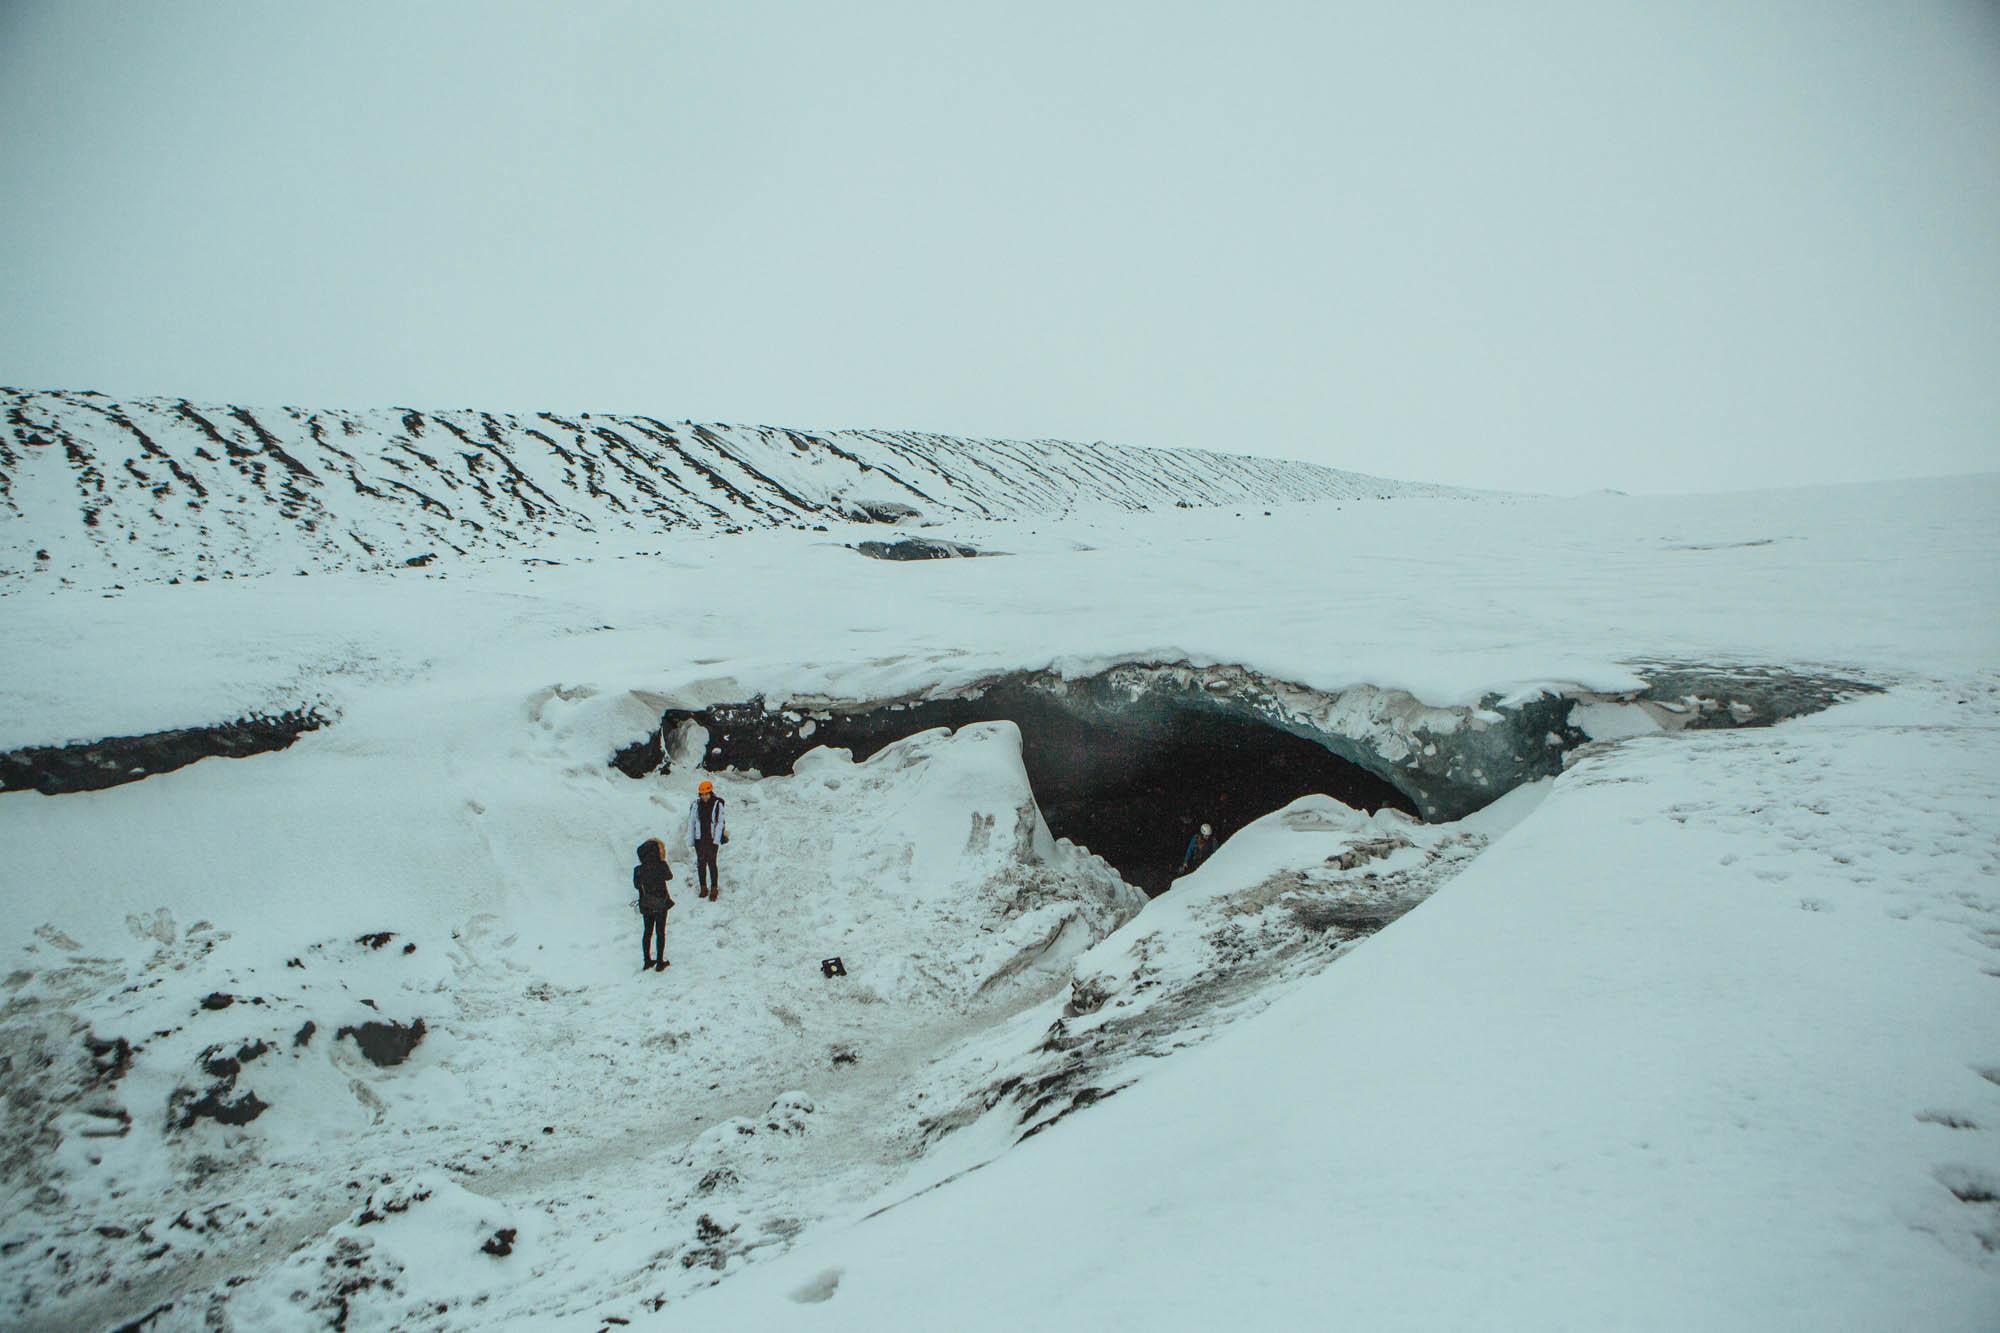 Ice Cave tour in Vatnajökull